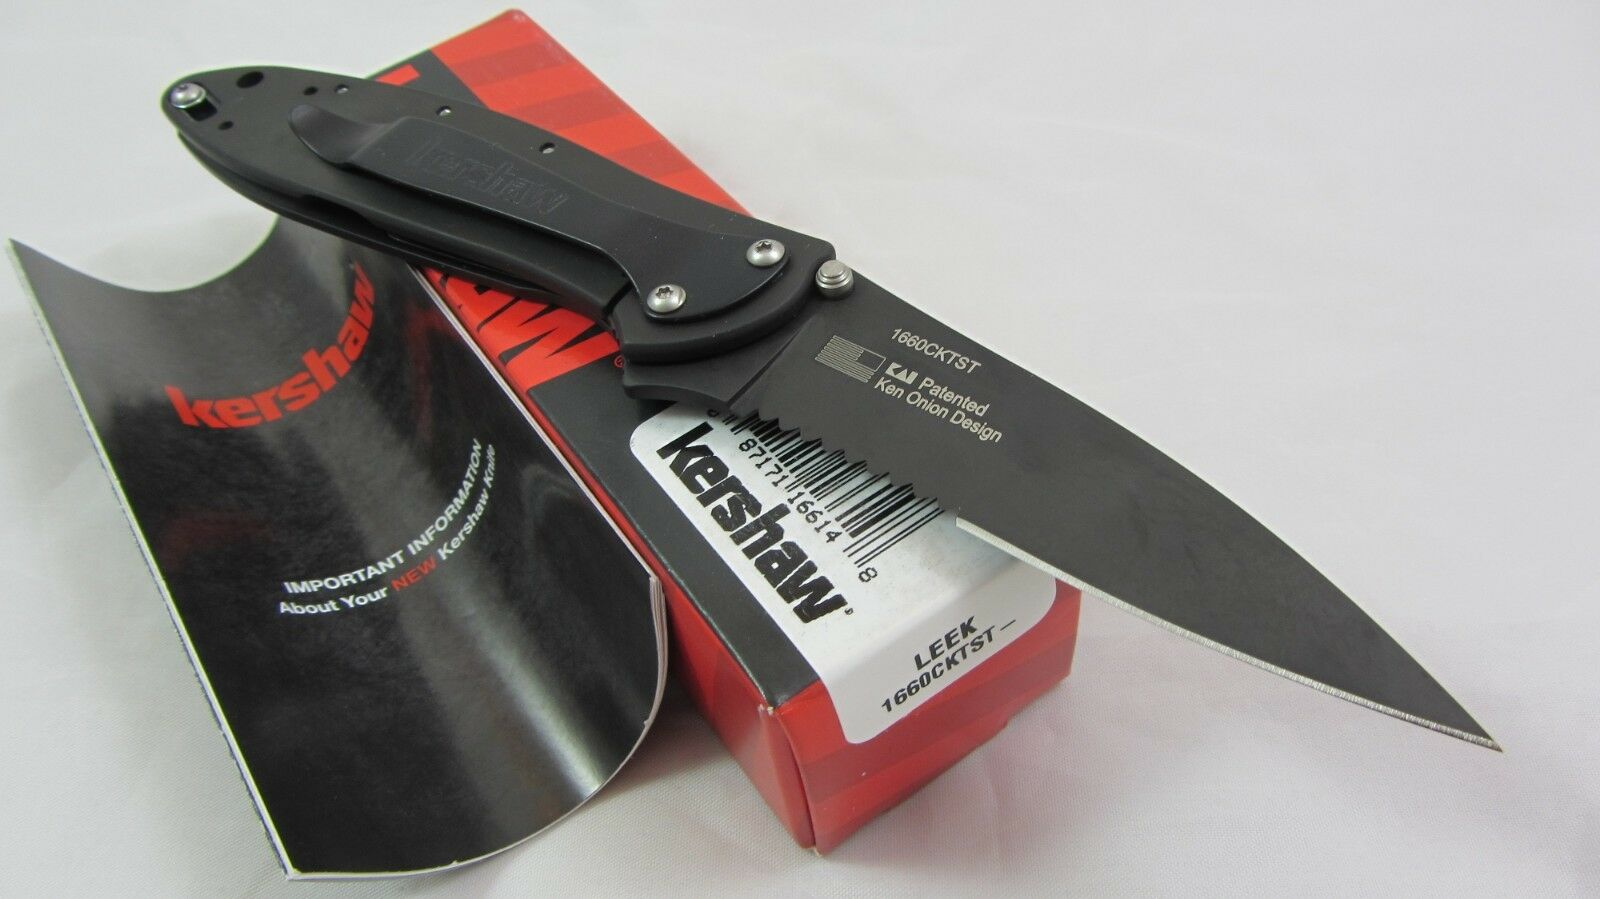 Kershaw 1660CKTST DLC Coated Leek Pocket Knife Assisted Opening Black USA Flag